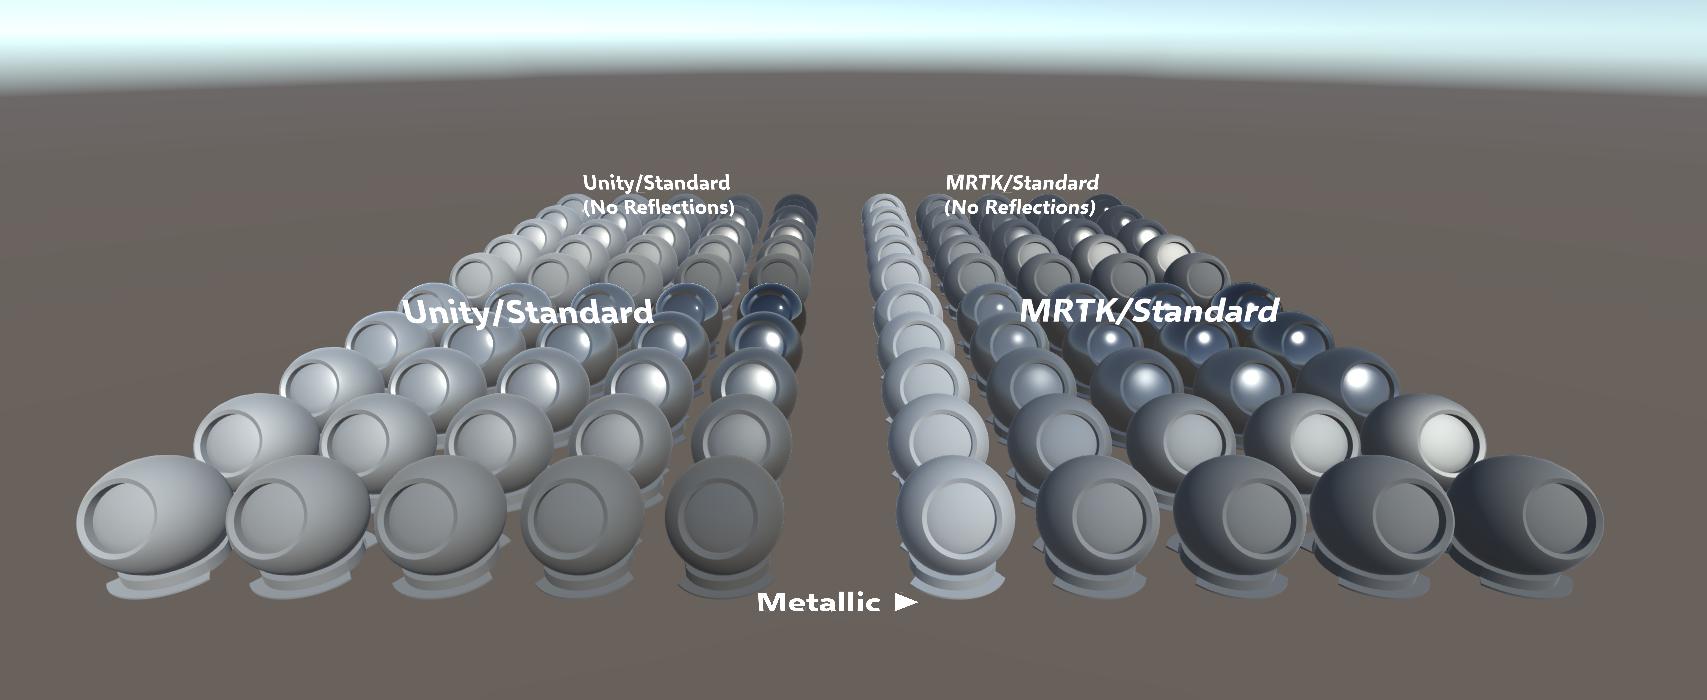 MaterialComparison